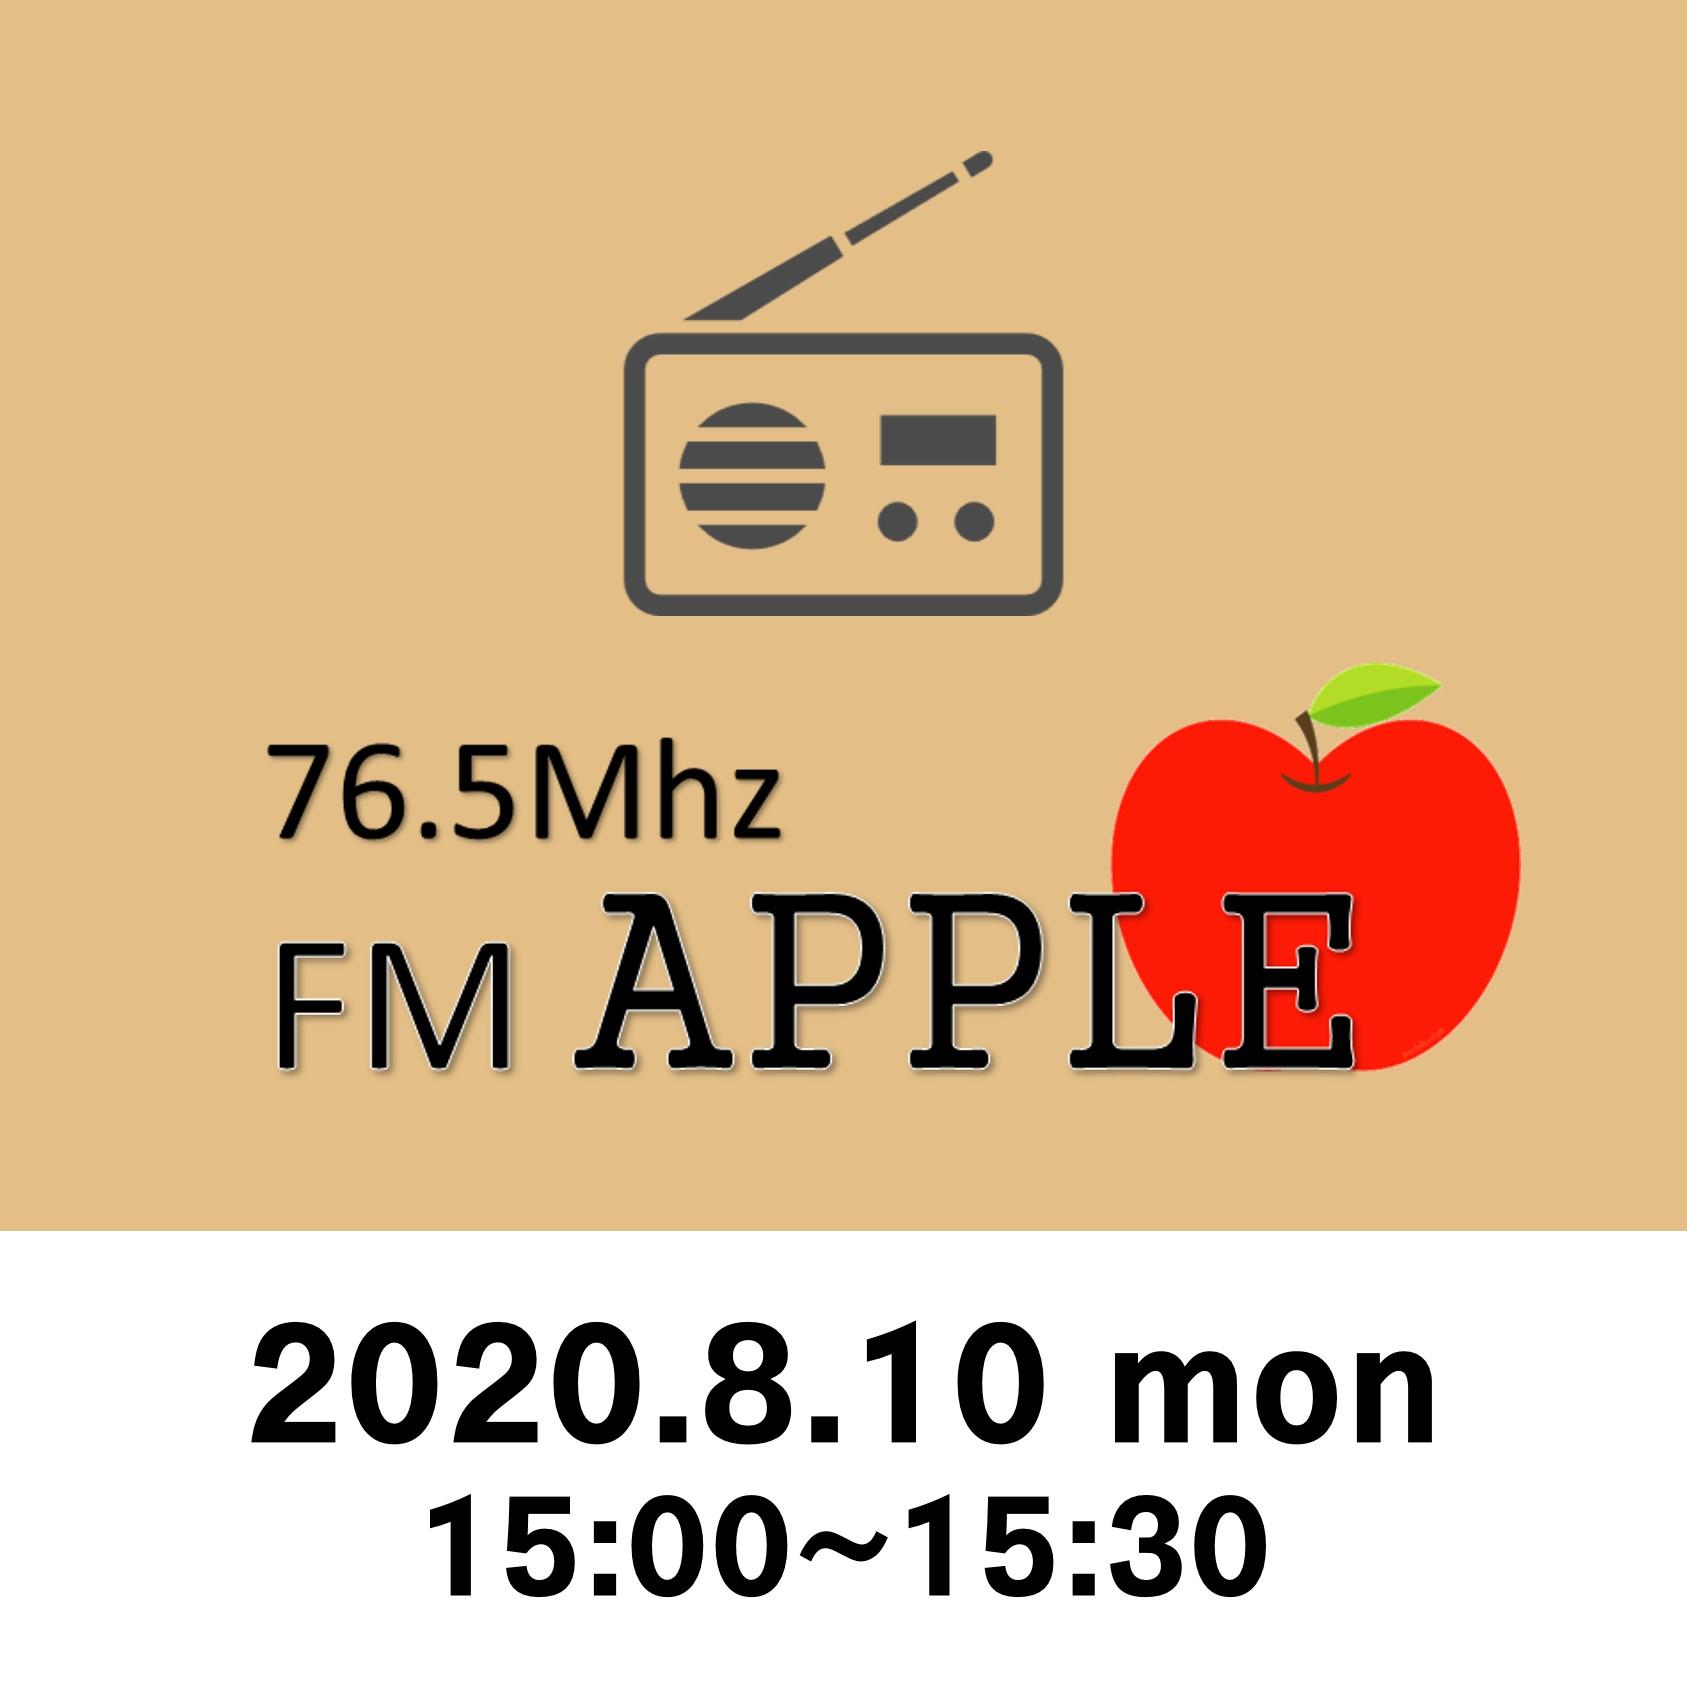 FMアップルラジオ